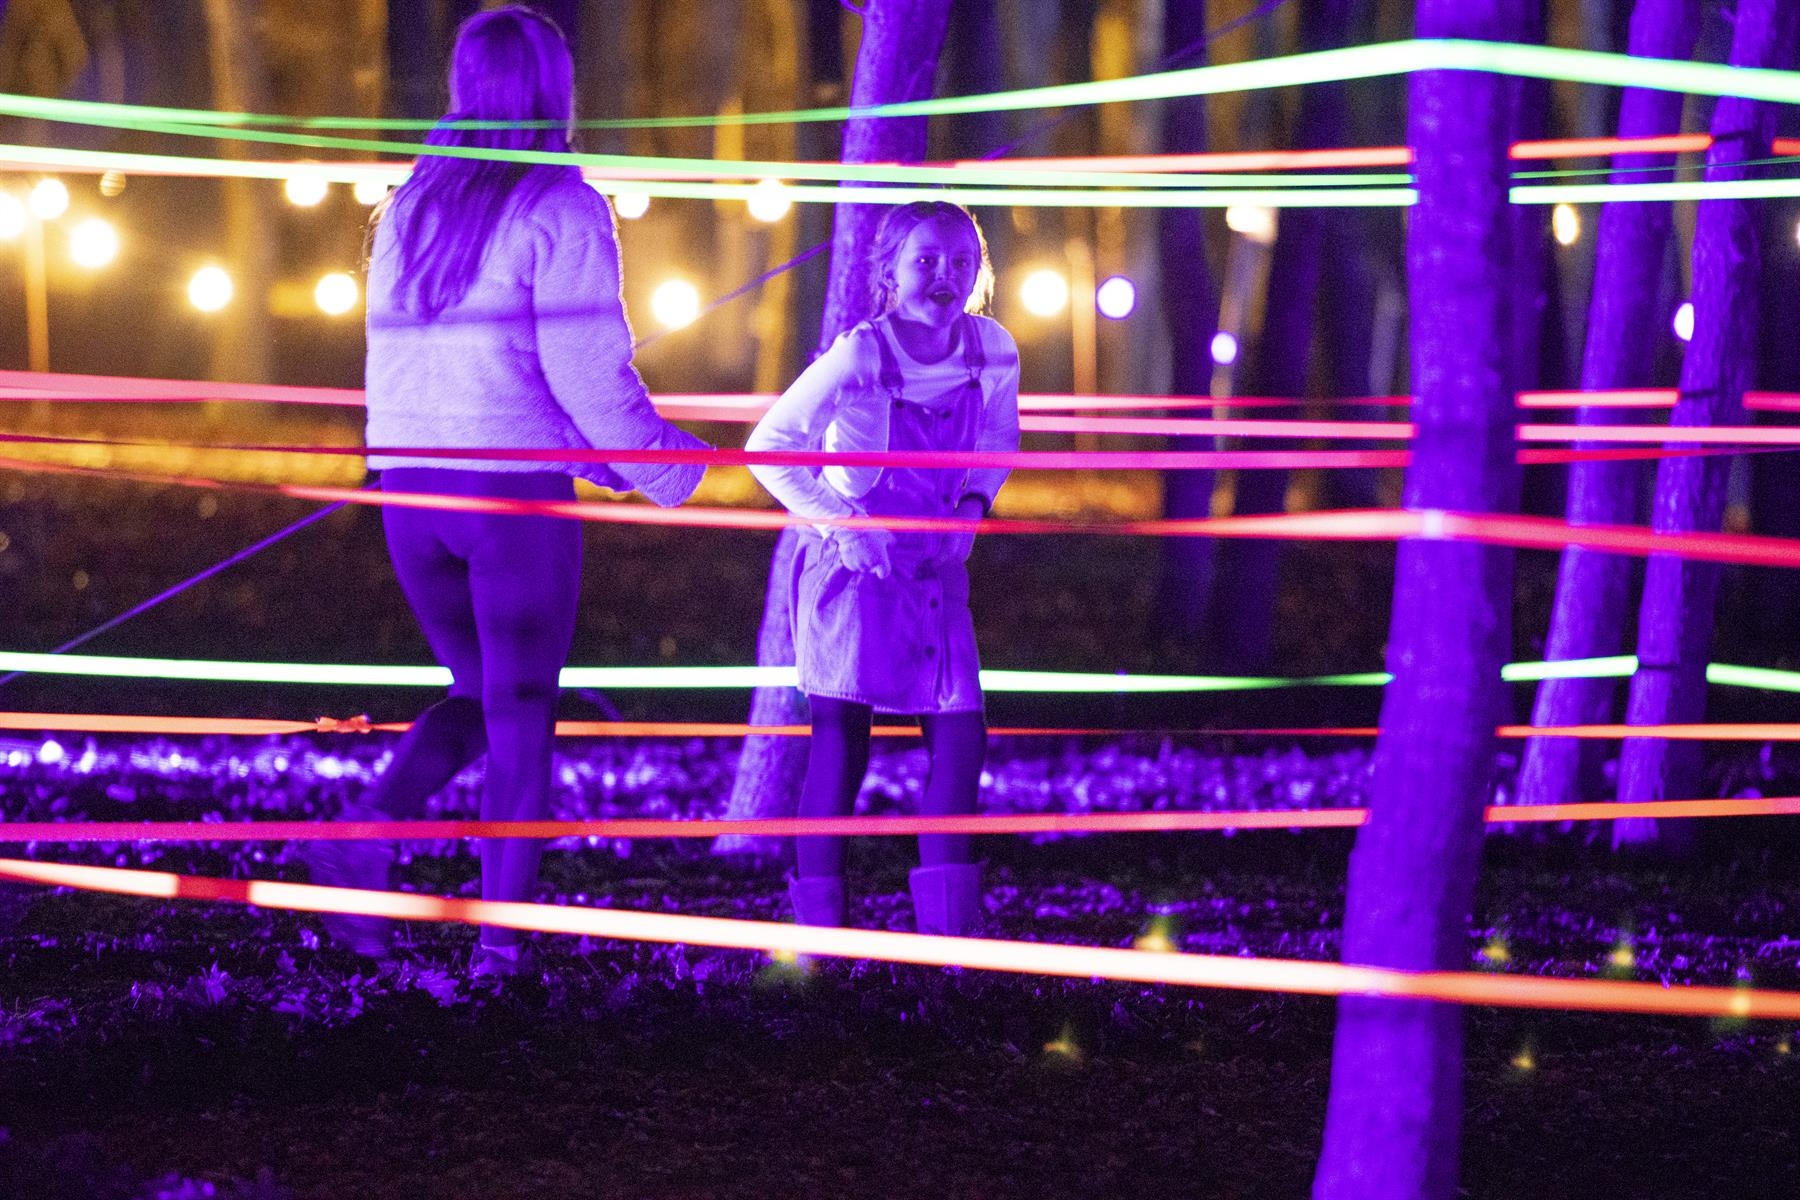 Image of maze installation at Illuminated Arboretum